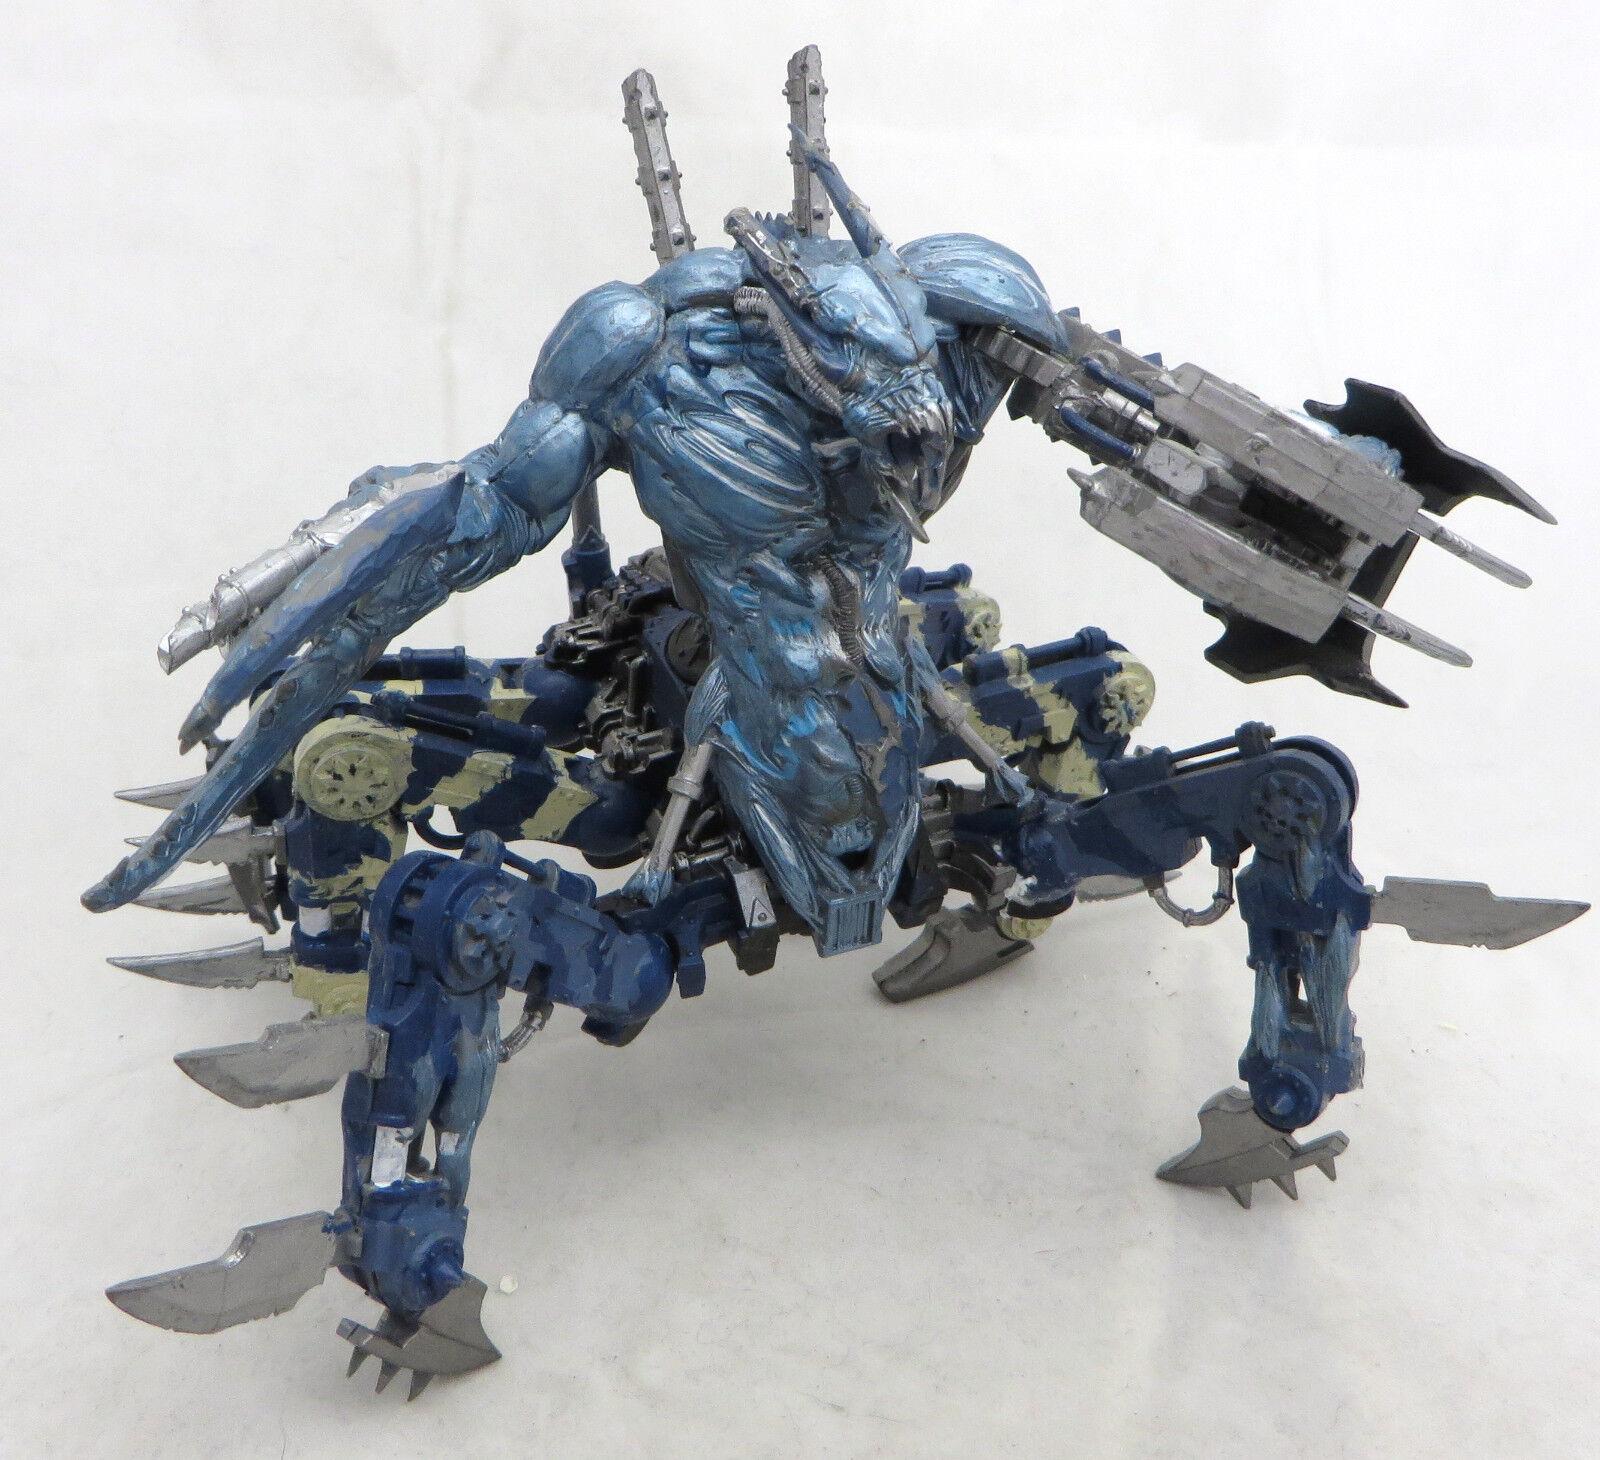 Warhammer 40K Chaos démon Demon soulgrinder Boîtes peintes thème